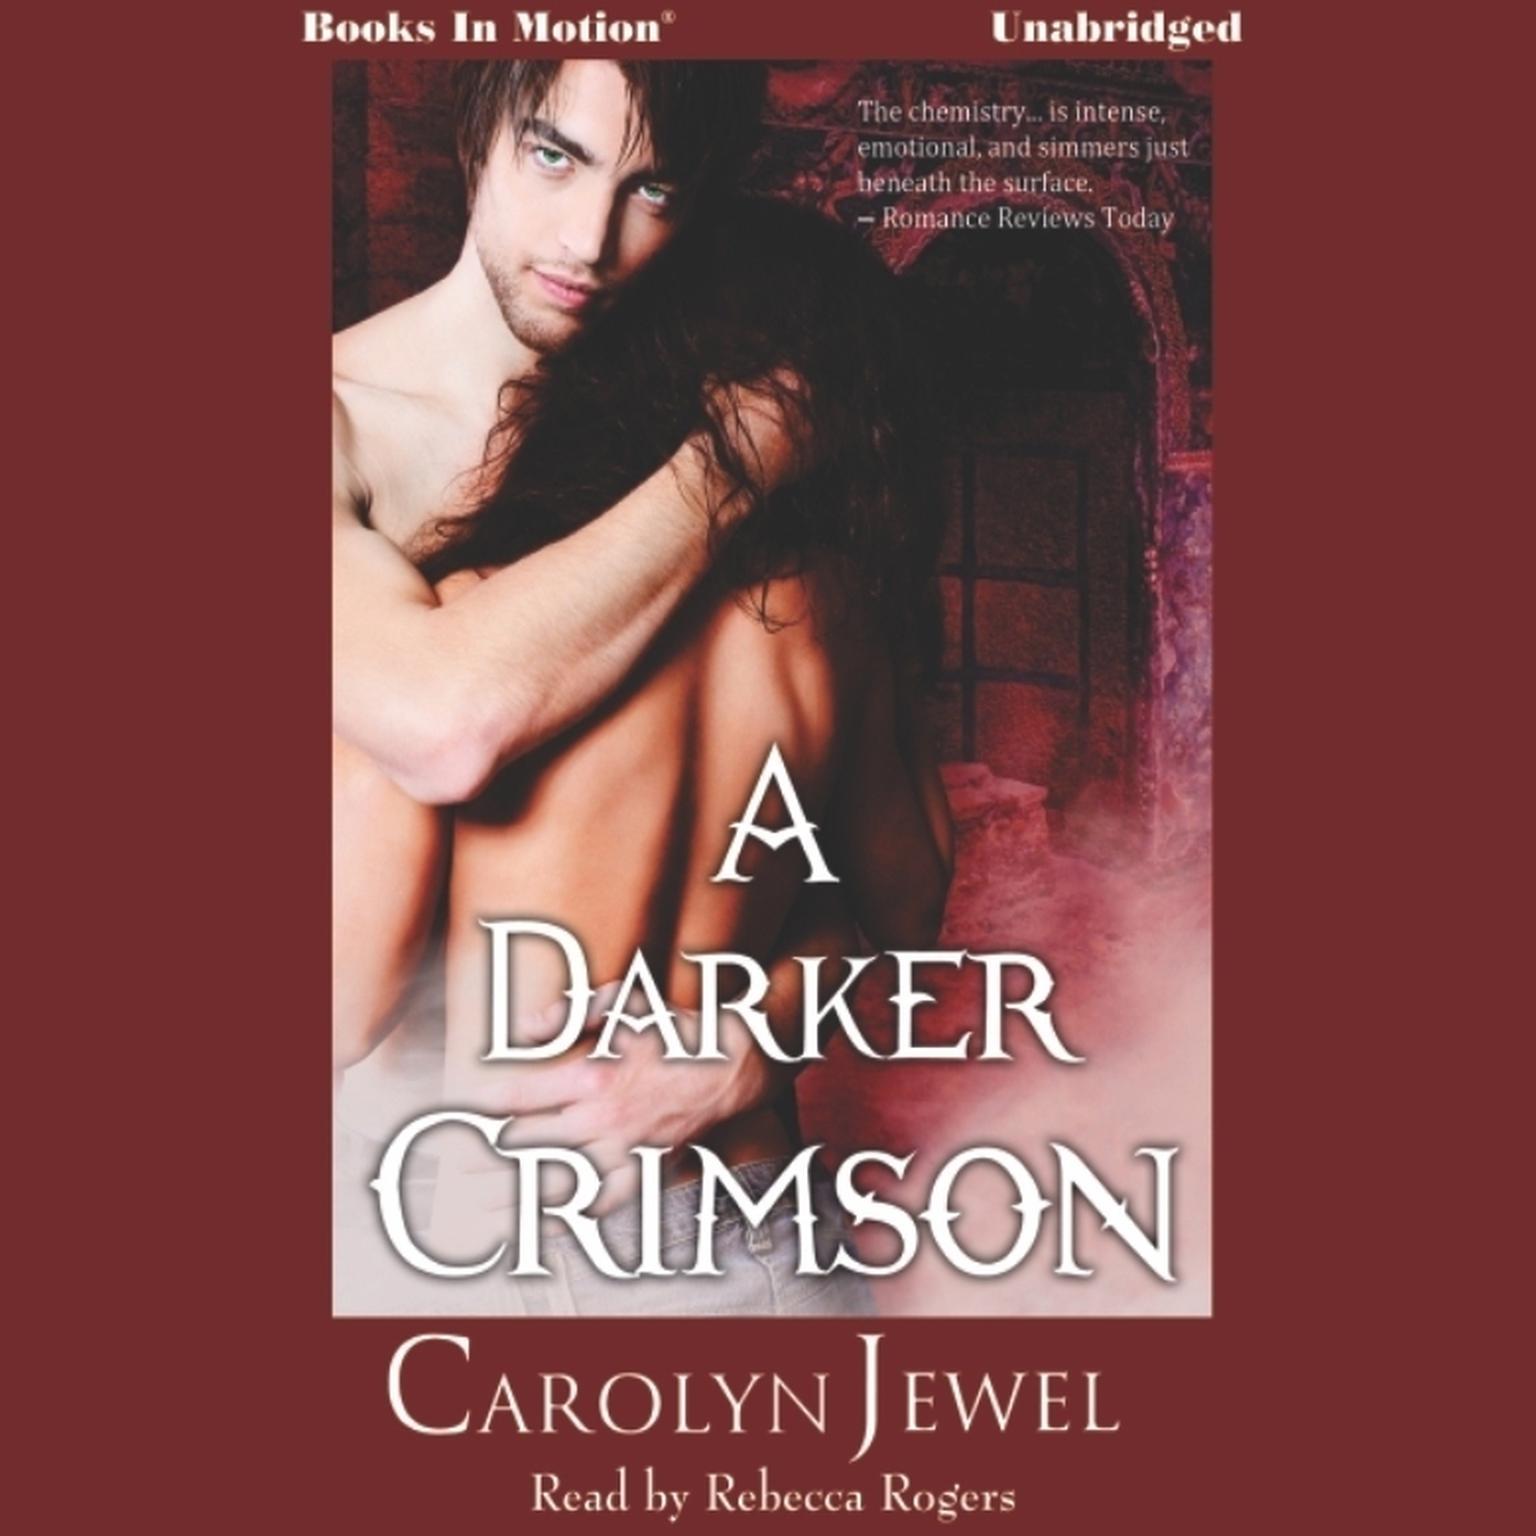 A Darker Crimson Audiobook, by Carolyn Jewel